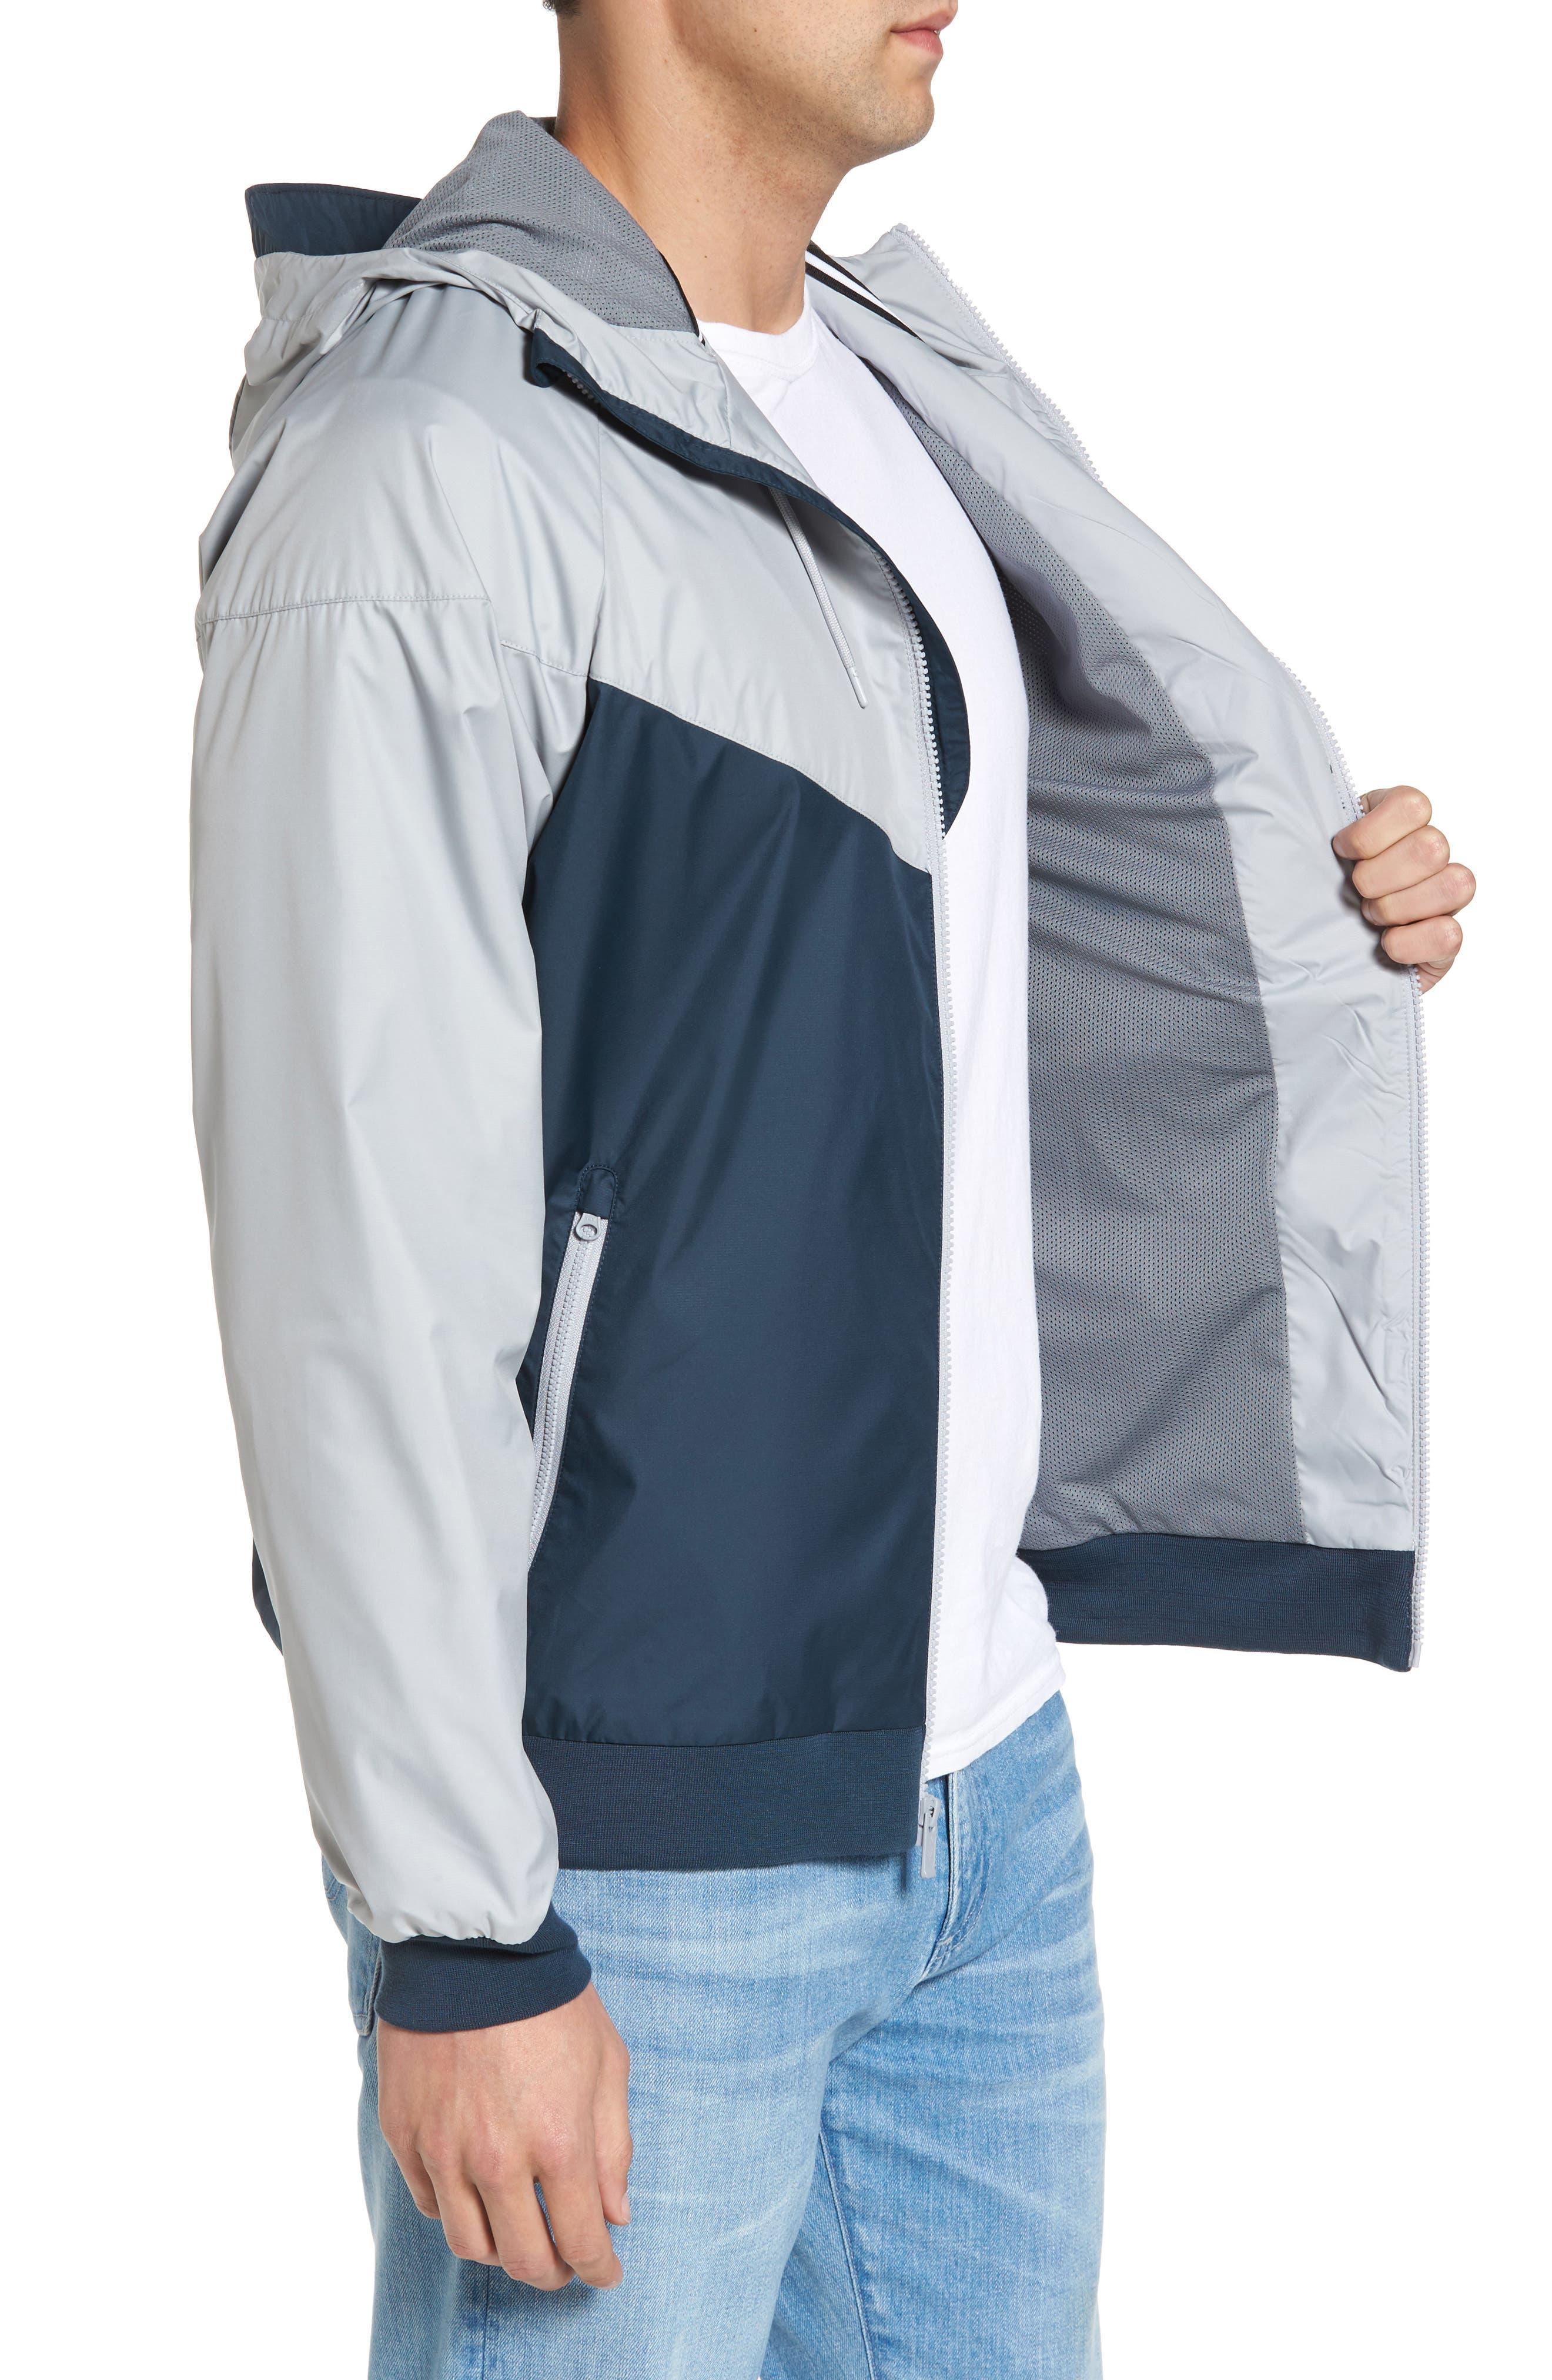 'Windrunner' Colorblock Jacket,                             Alternate thumbnail 3, color,                             GREY/ BLUE